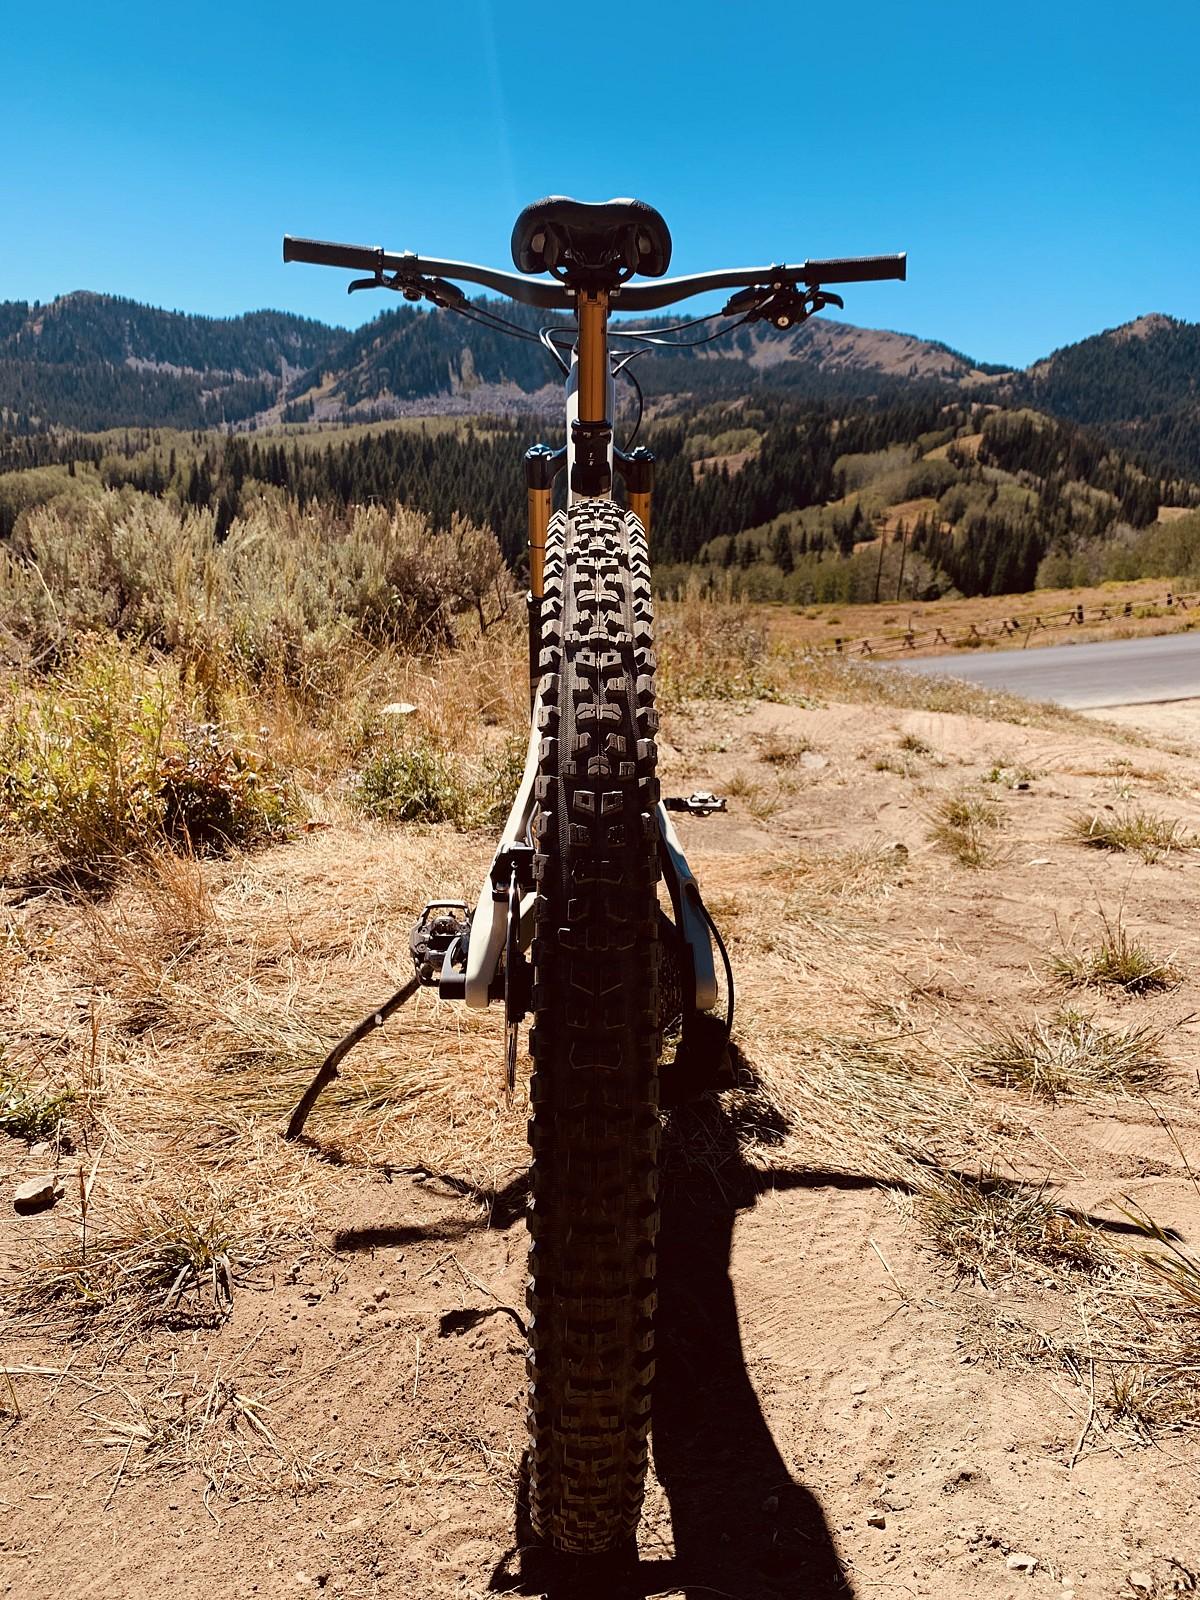 IMG E0196 - jaykalafatis - Mountain Biking Pictures - Vital MTB